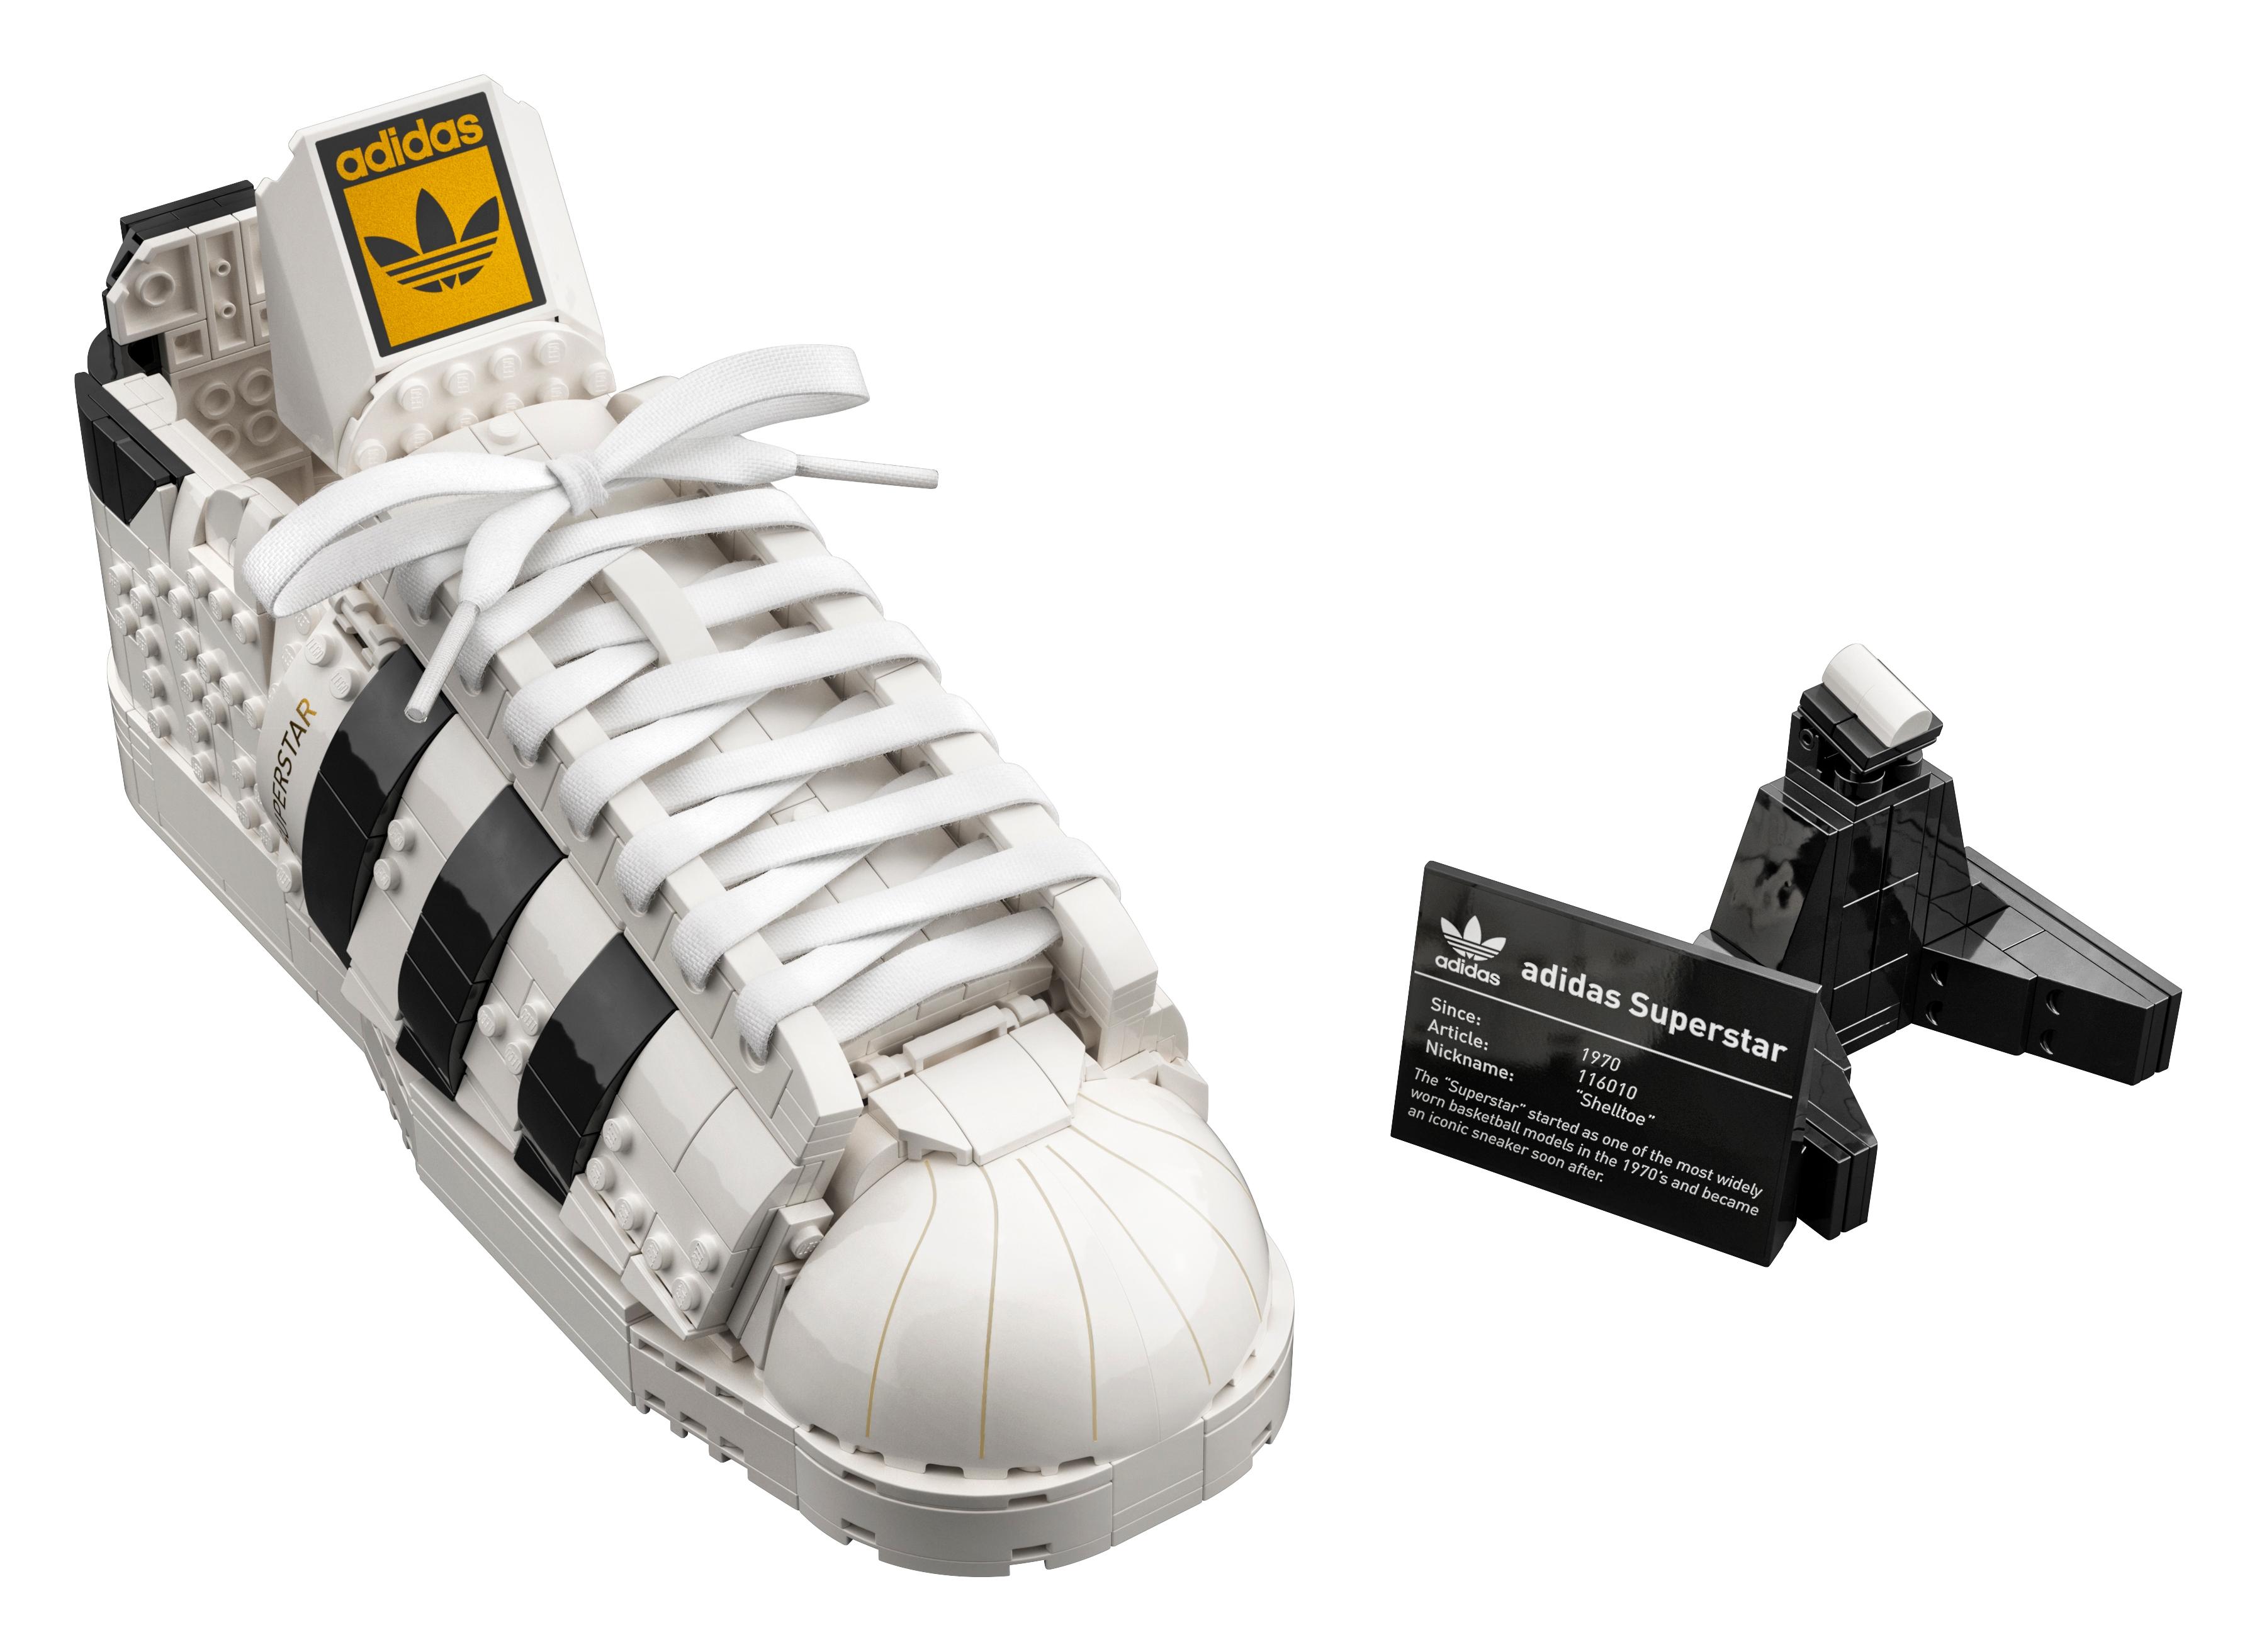 adidas Originals Superstar 10282 | Creator Expert | Buy online at the Official LEGO® Shop US